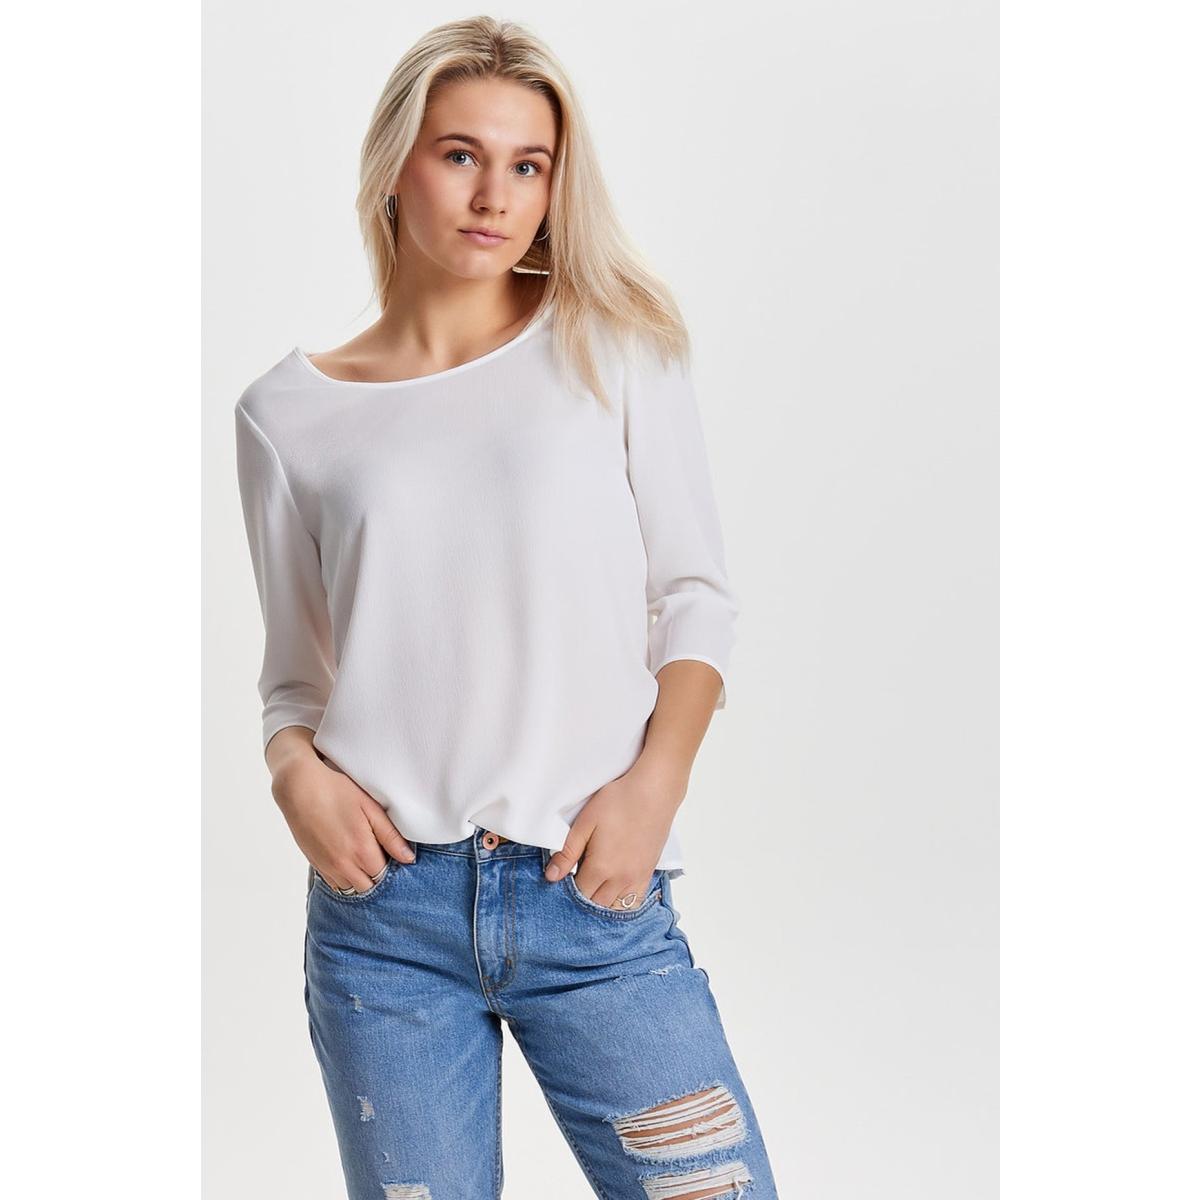 onlvic 3/4 solid top noos wvn 15150195 only t-shirt cloud dancer